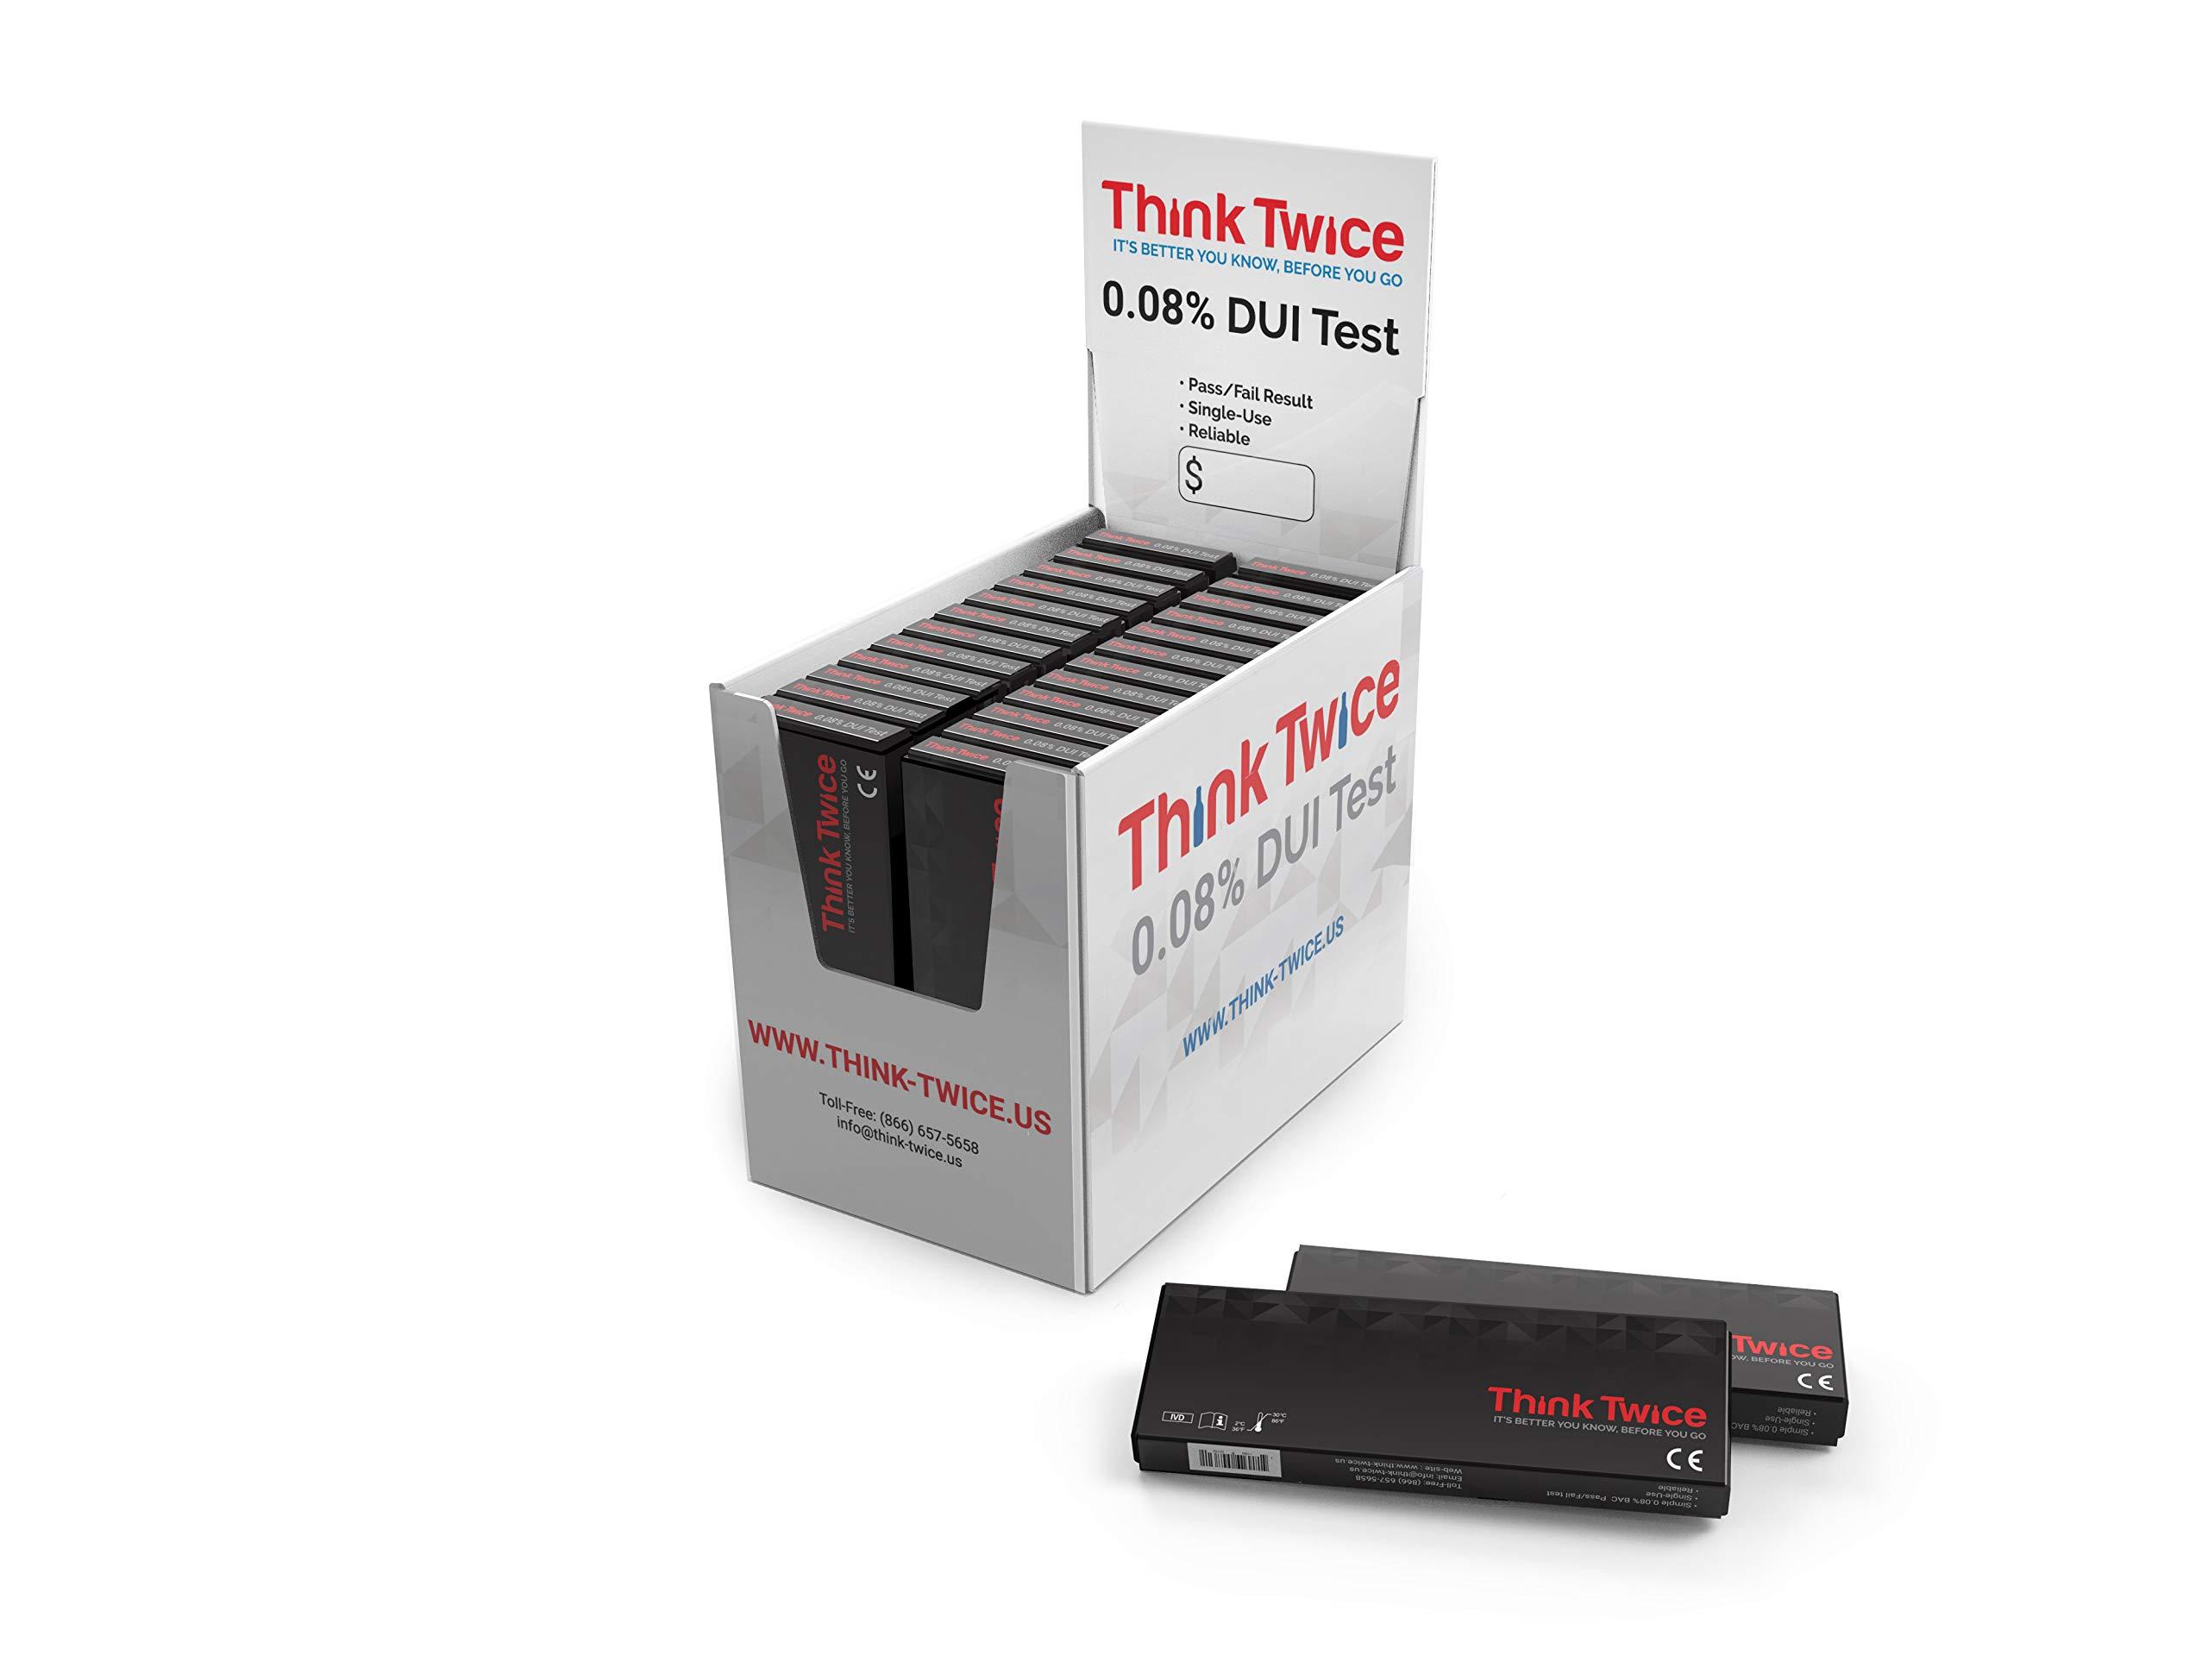 Think Twice Single-Use 0.08% BAC Test - 24 Count Box